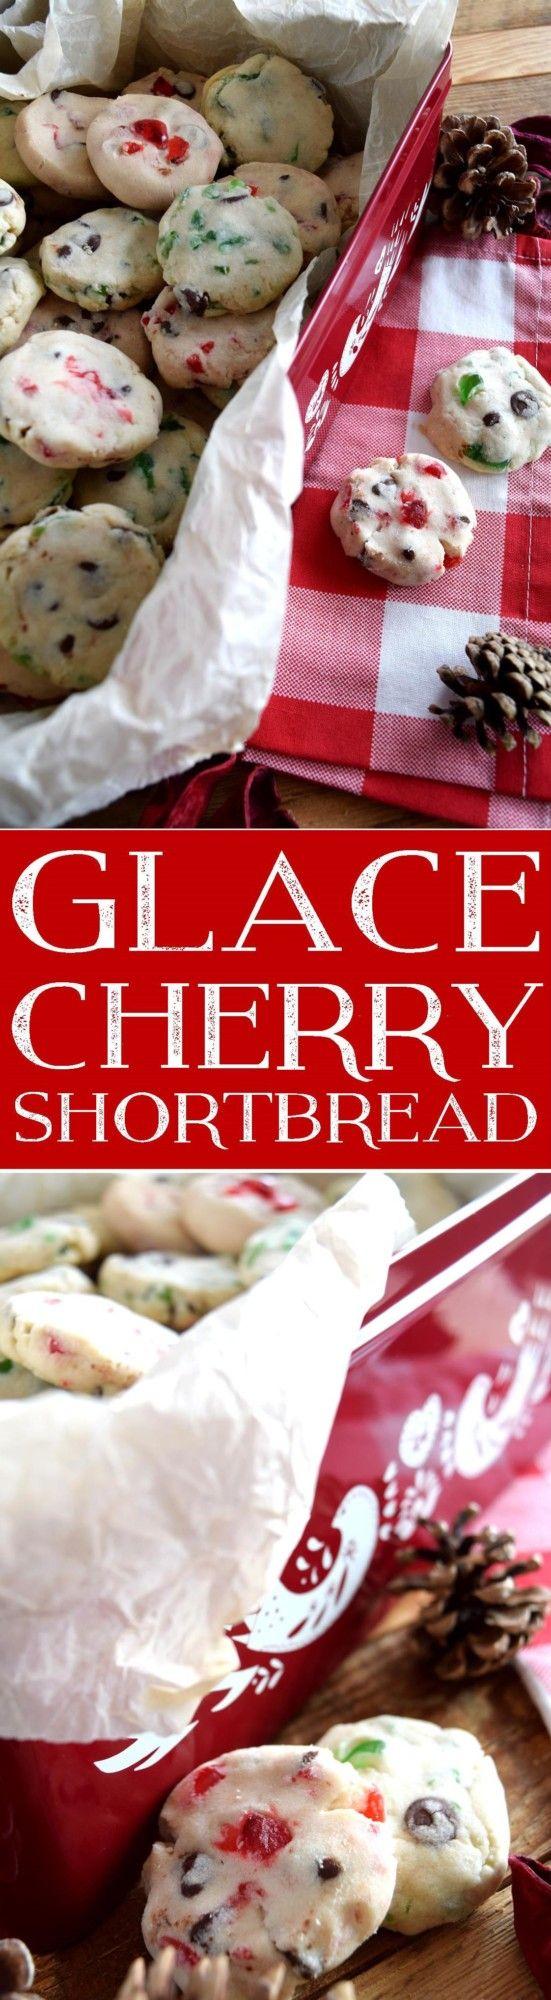 Glace Cherry Shortbread Cookies take regular shortbread cookies and make them into a festive Christmas treat!